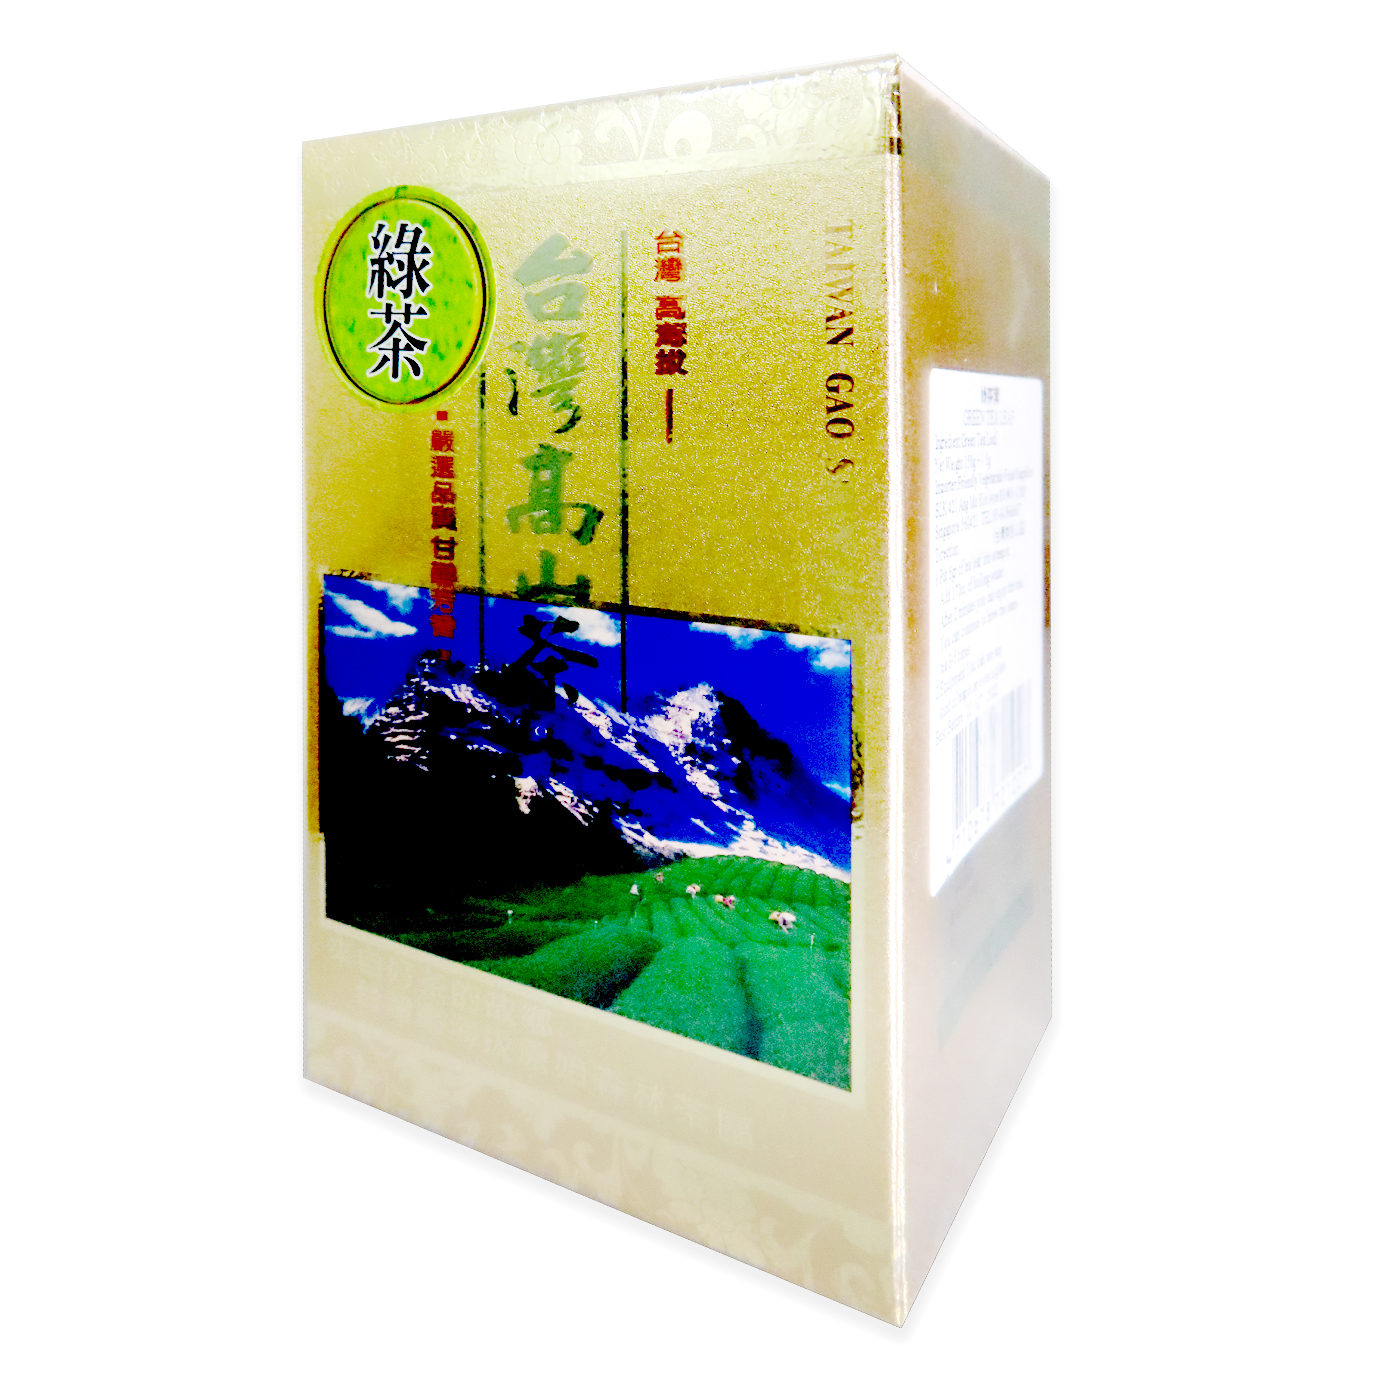 Image Gao Shan Green Tea 高山绿茶 150grams